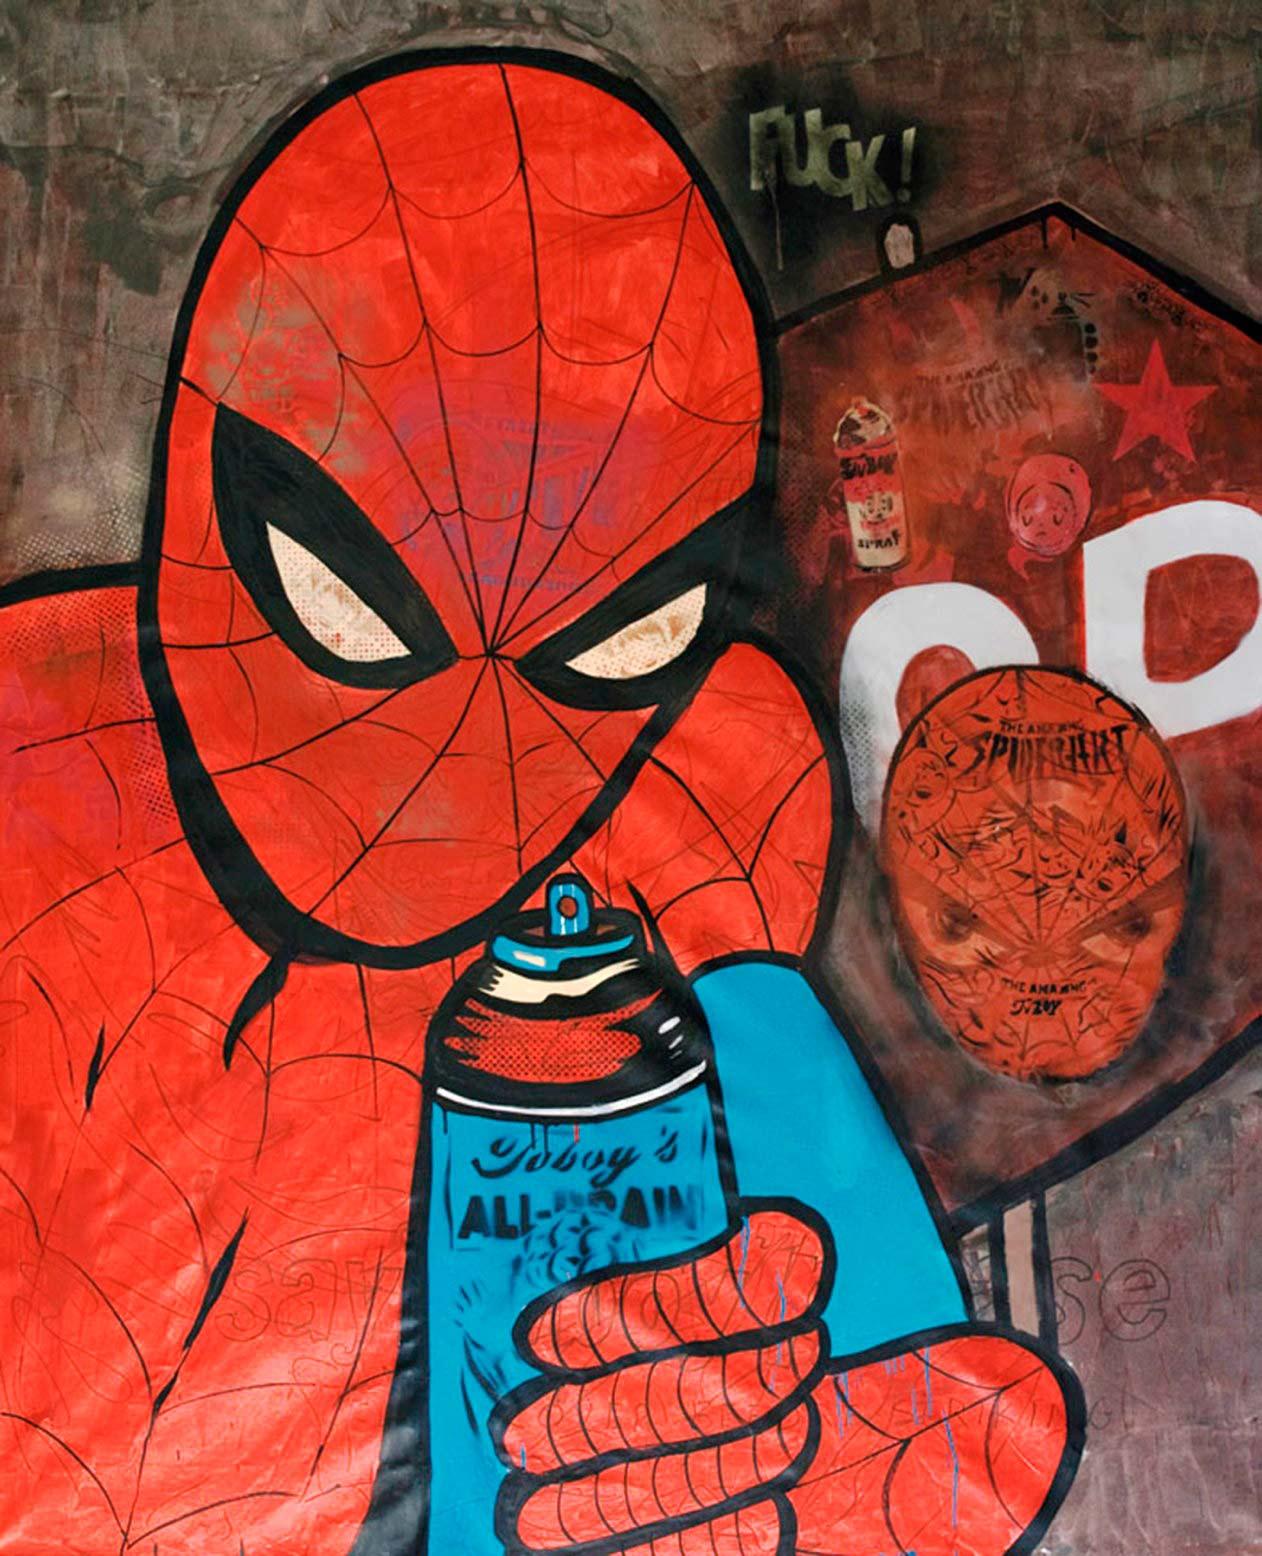 The Amazing Spider Art - TV Boy